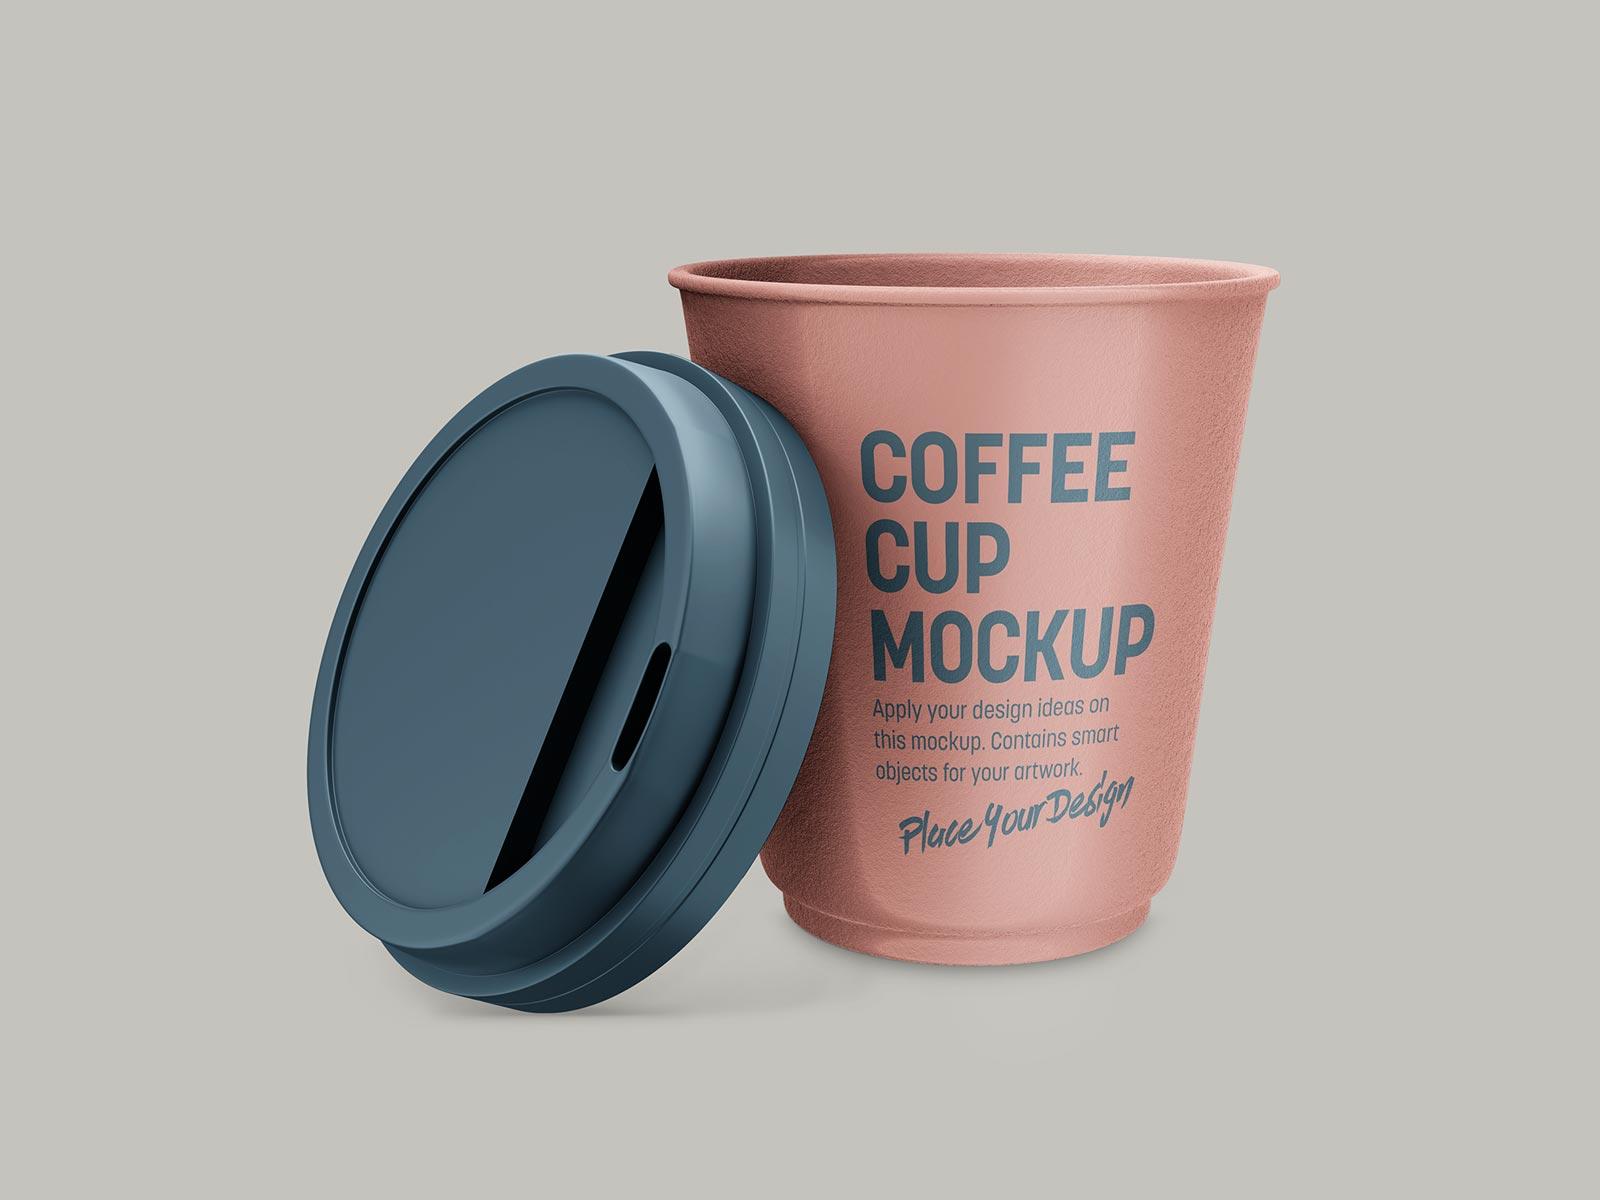 Free-Cardboard-Coffee-Cup-Mockup-PSD-2